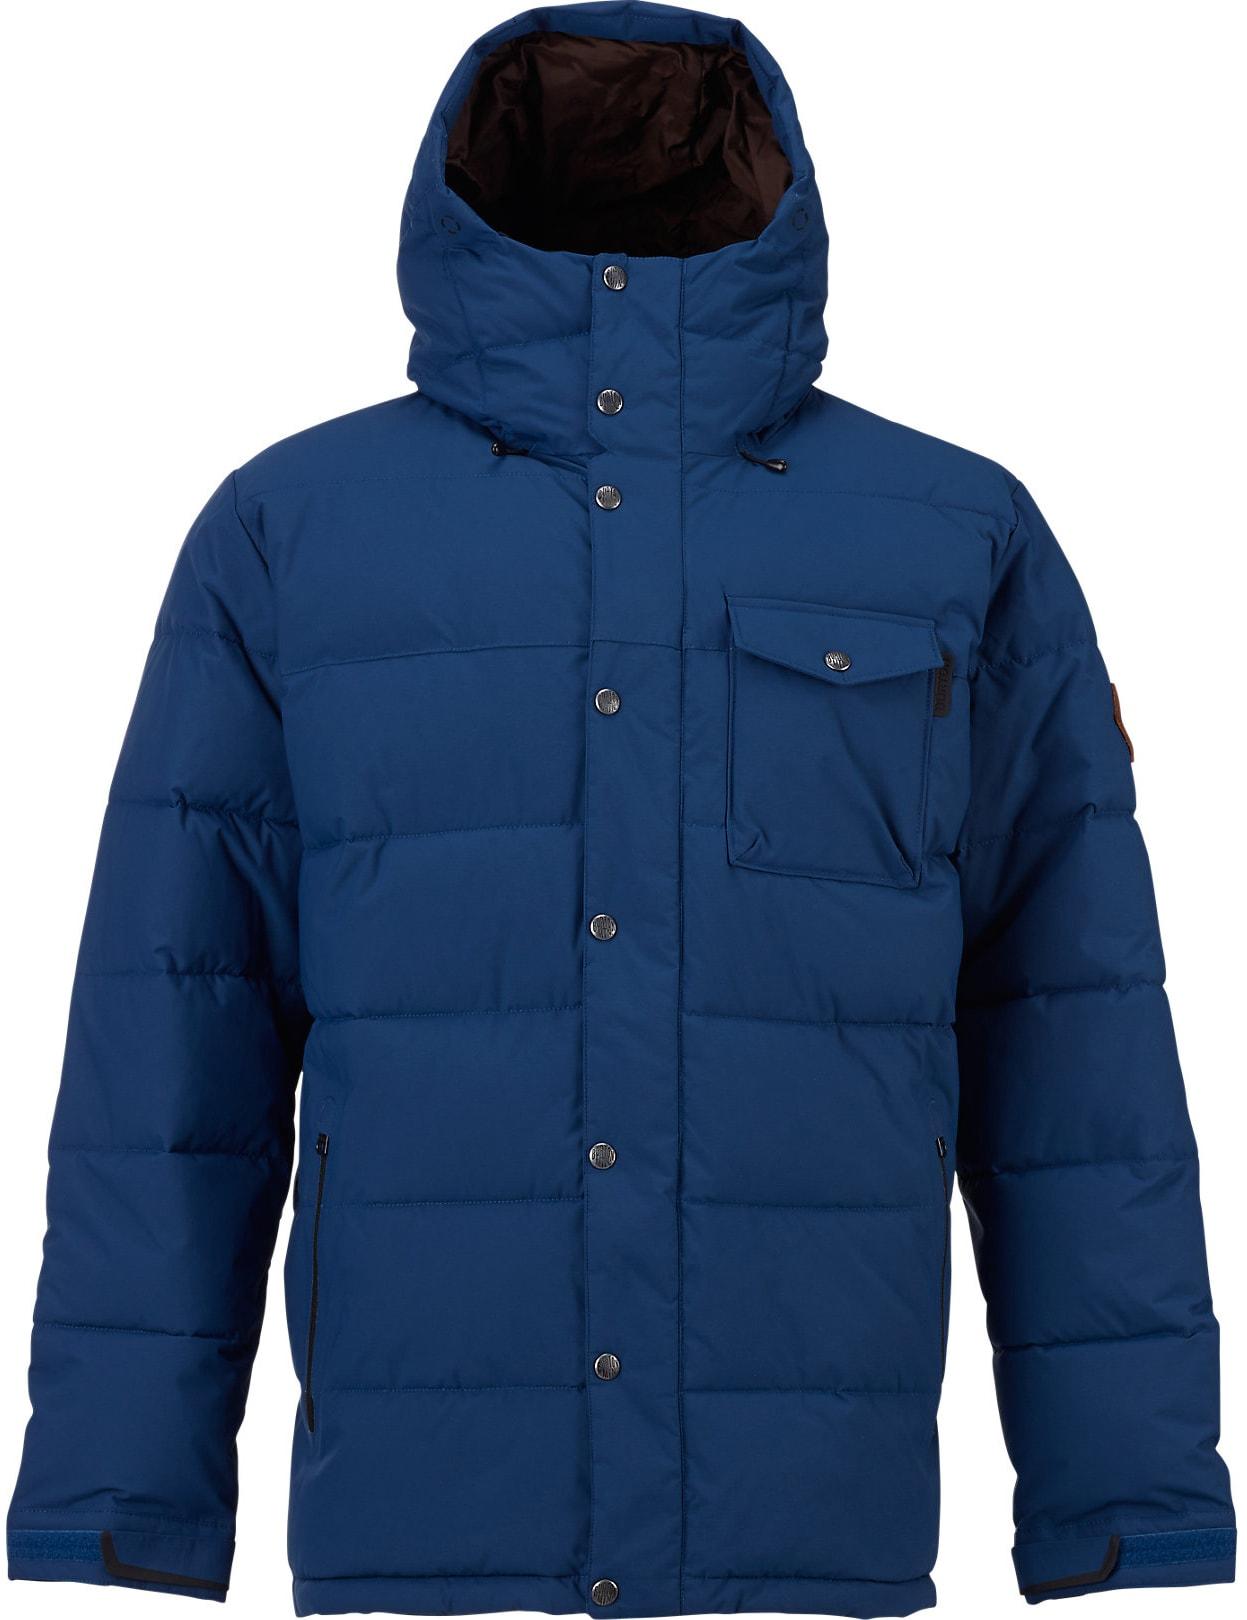 On Sale Burton Traverse Snowboard Jacket Up To 40 Off